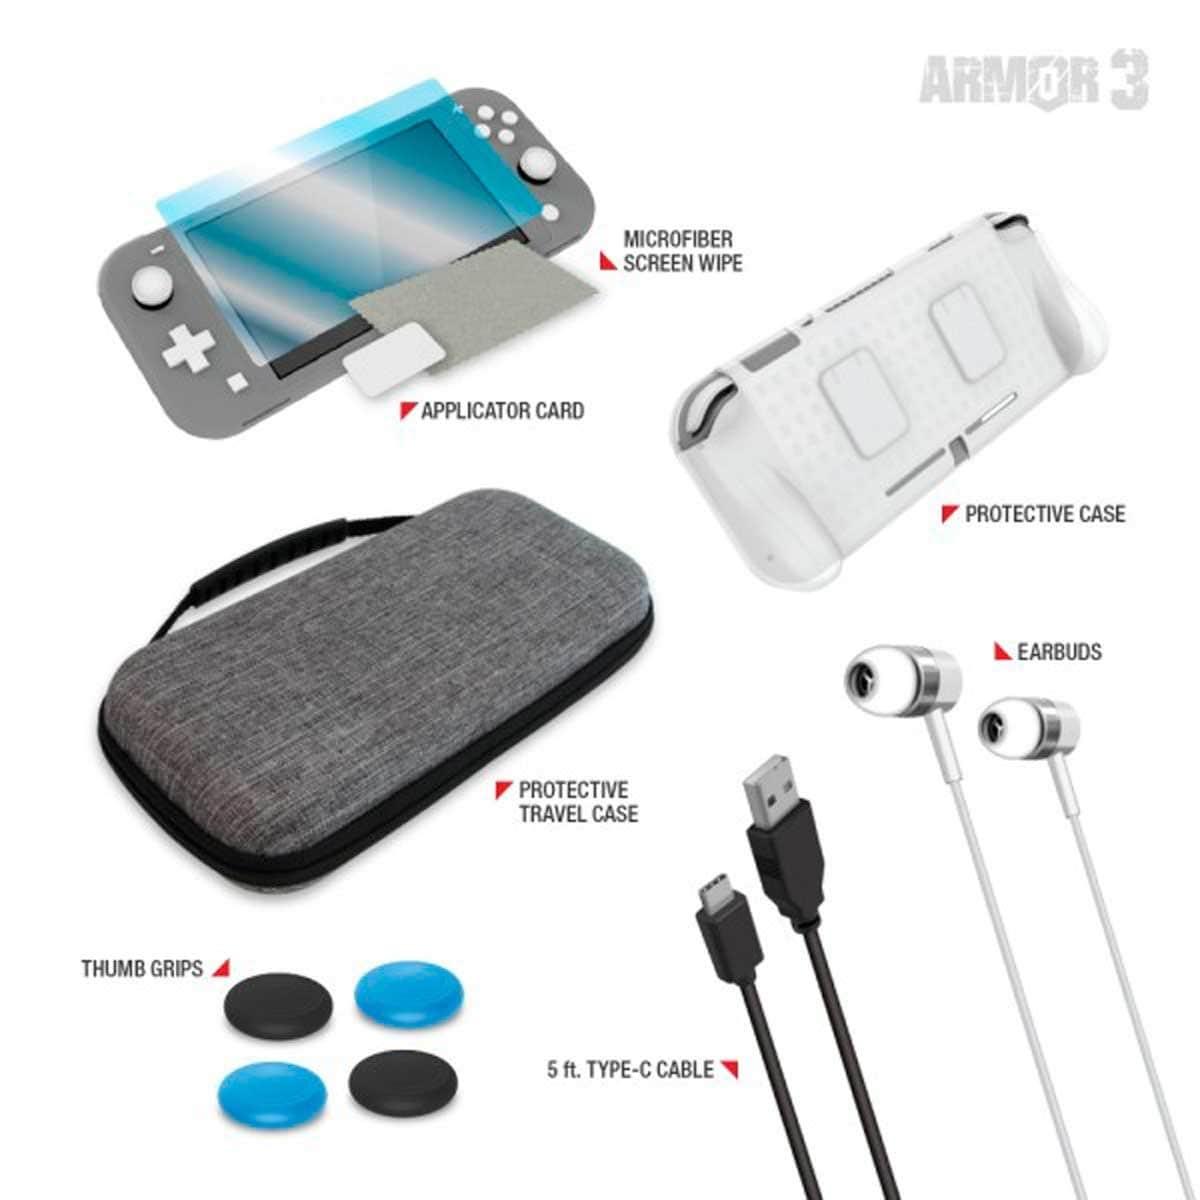 Kit Protector de Viaje Armor 3 Nintendo Switch